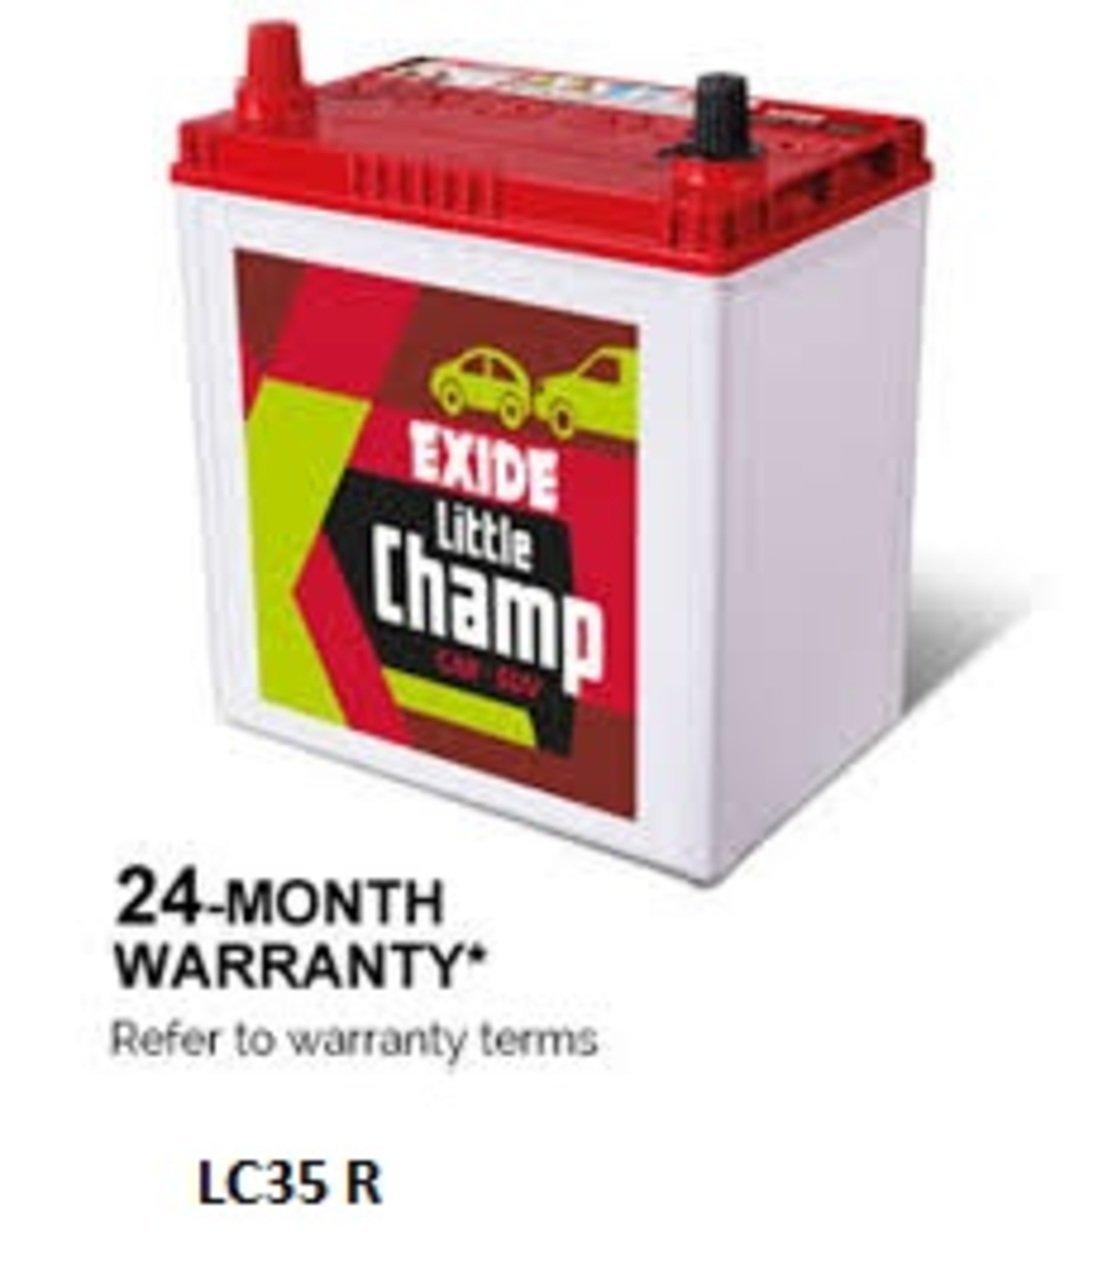 Exide little champ 35 ah battery